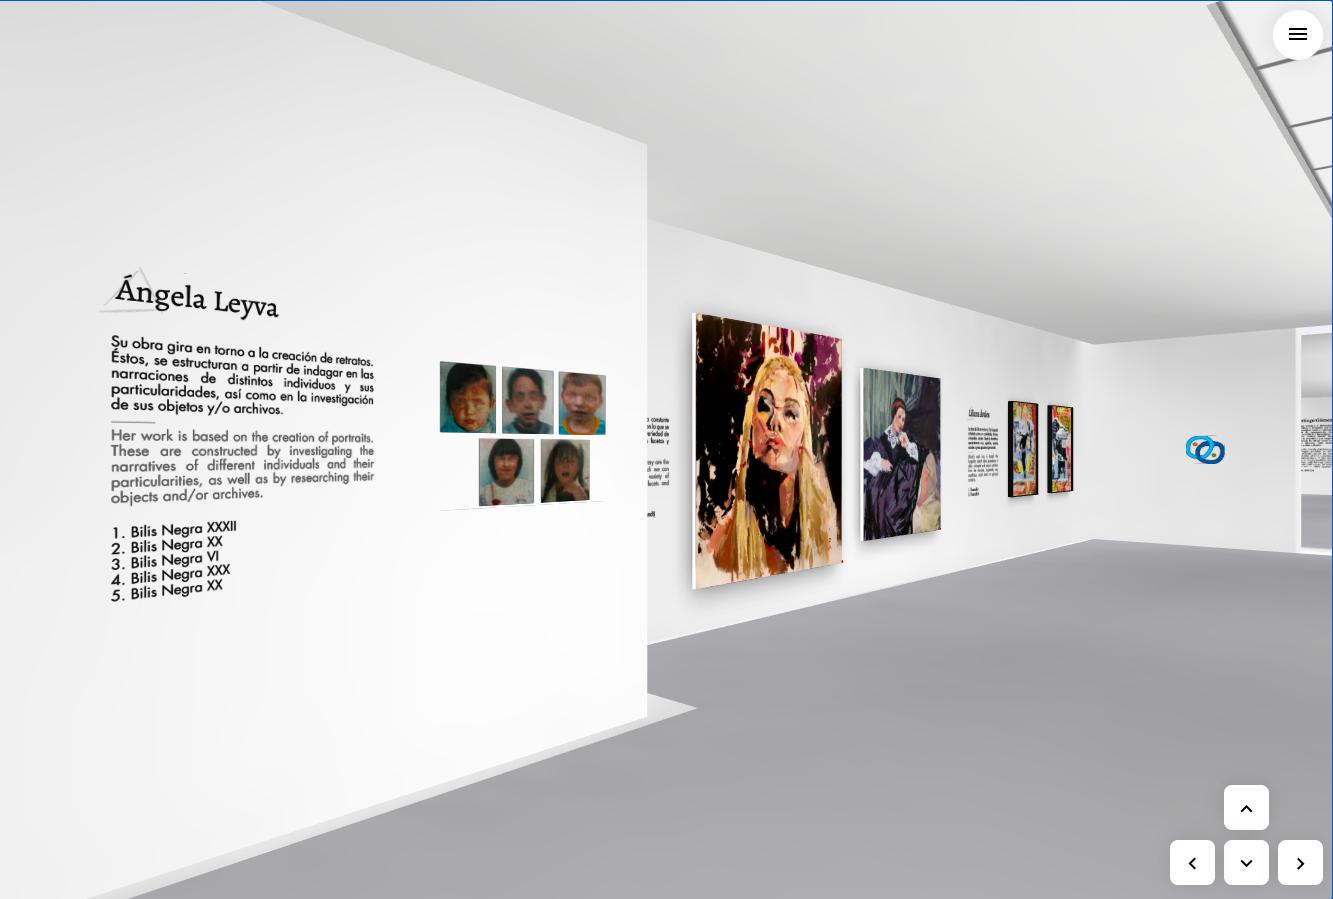 The-Incomplexe-Tpia-expo-virtual-artistas-emergentes-alt